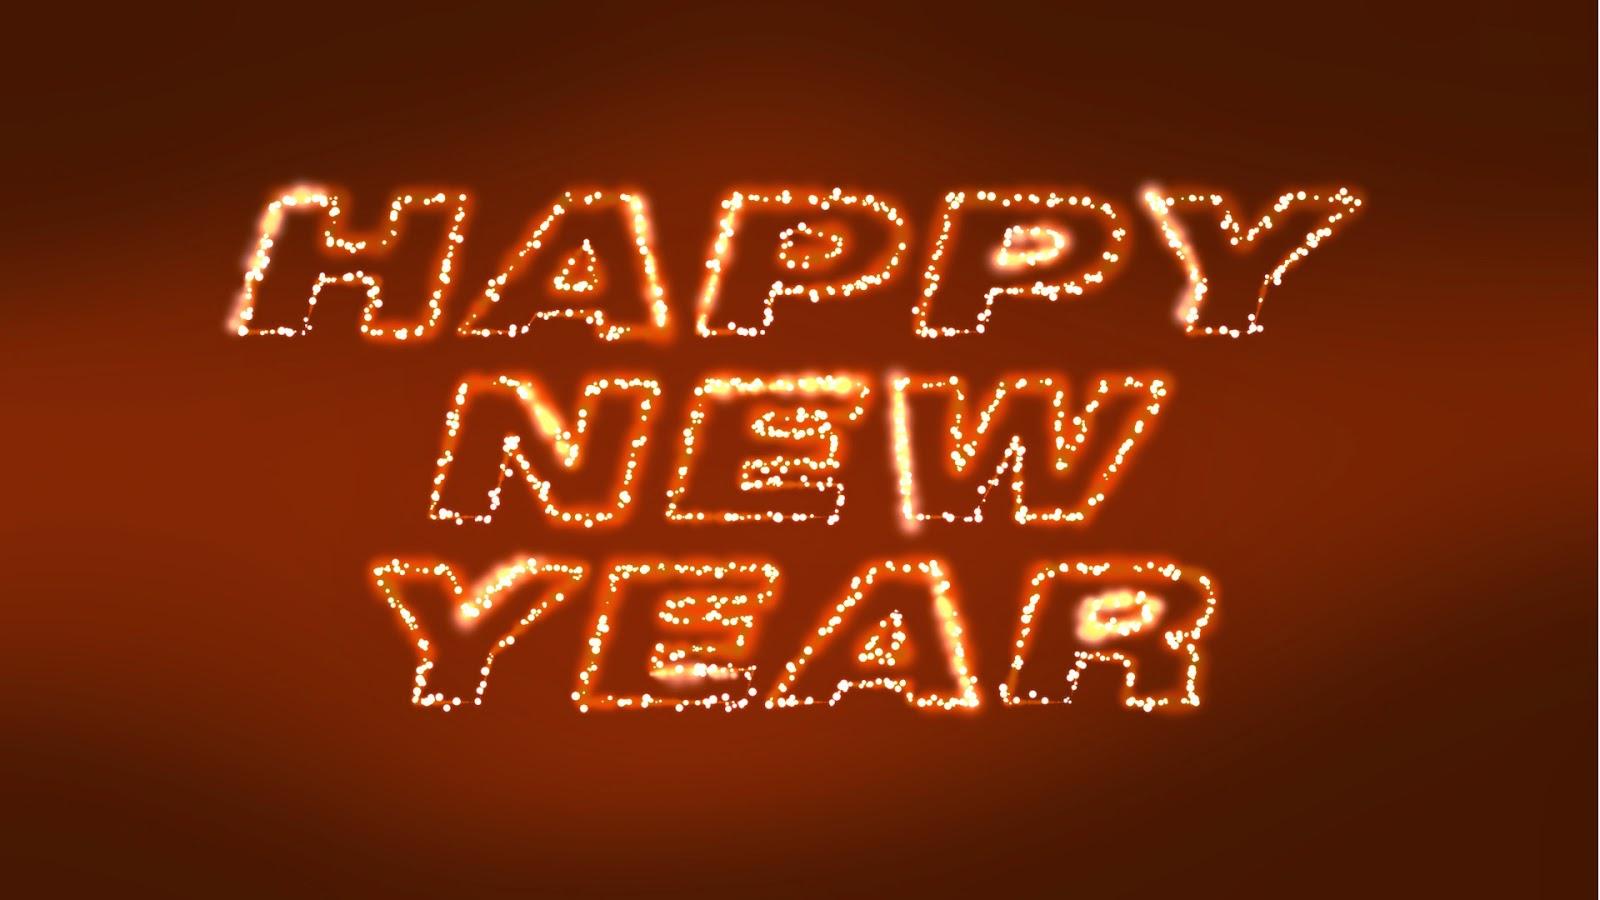 Advance Happy New Year 2015 HD Desktop Wallpaper Download Happy New 1600x900